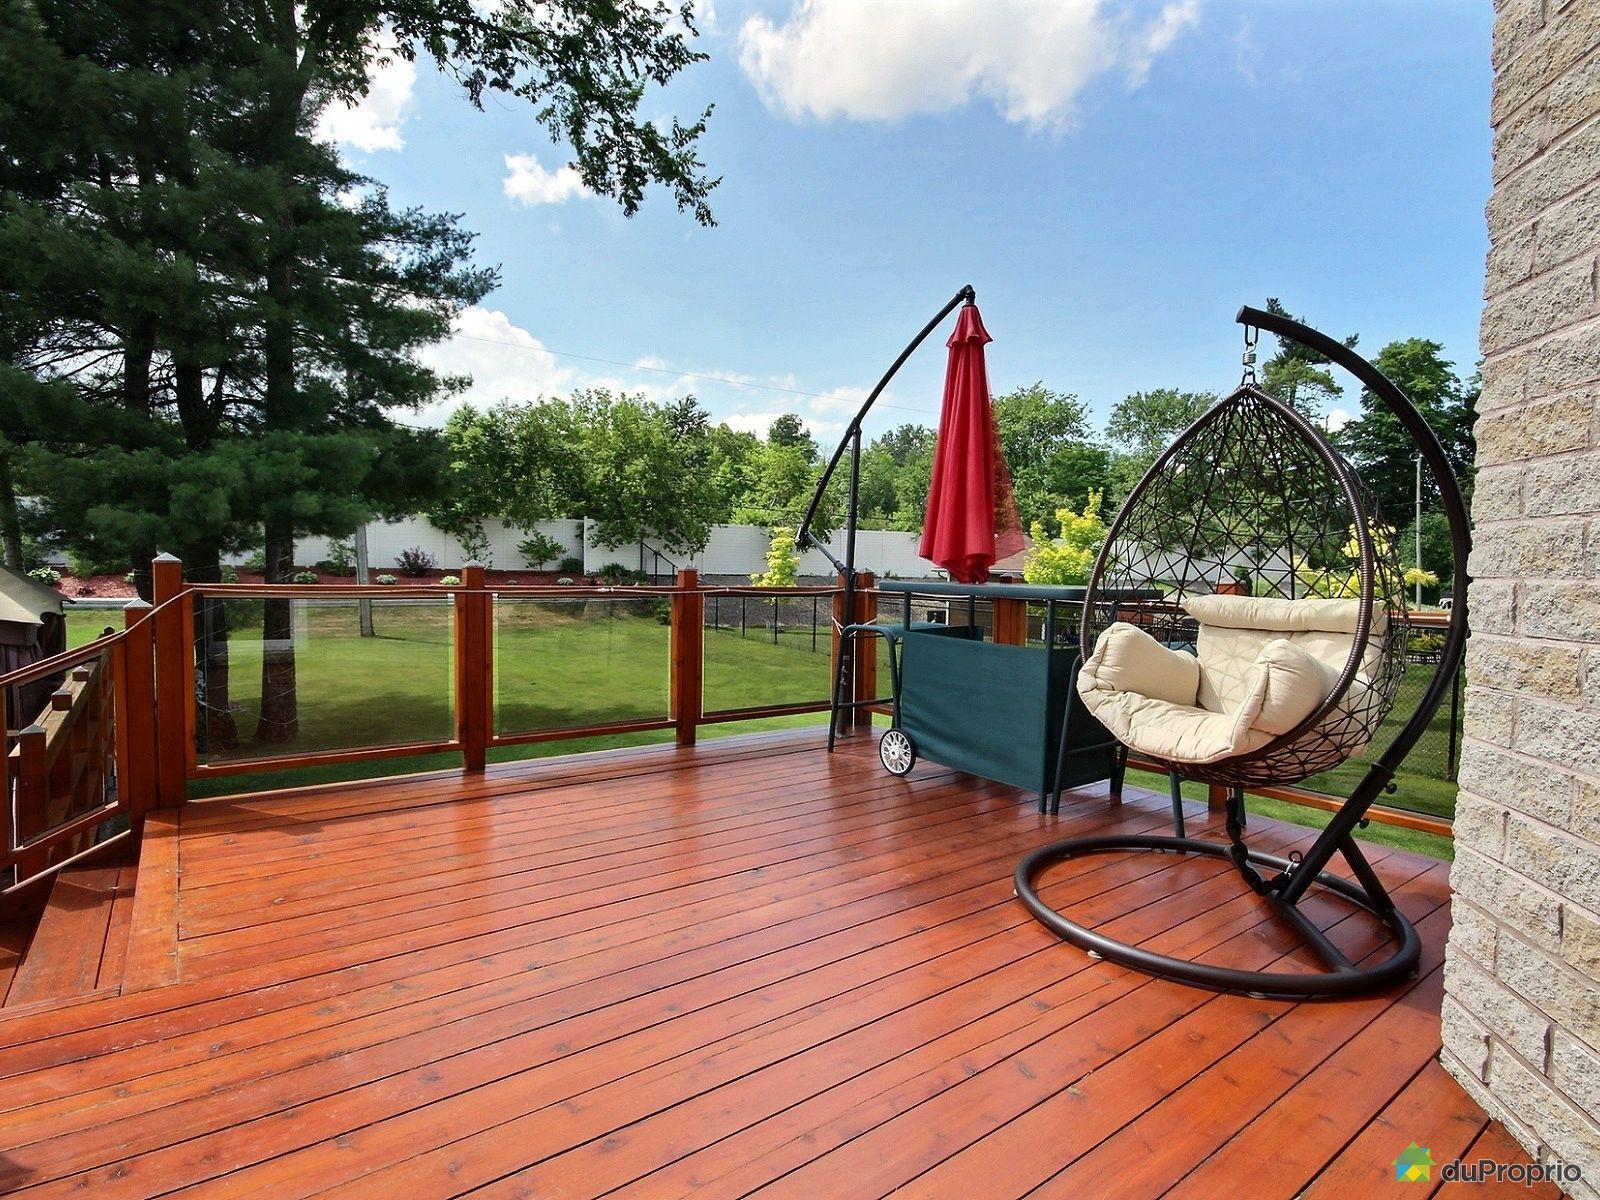 maison-a-vendre-gatineau-aylmer-quebec-province-1600-6353717.jpg